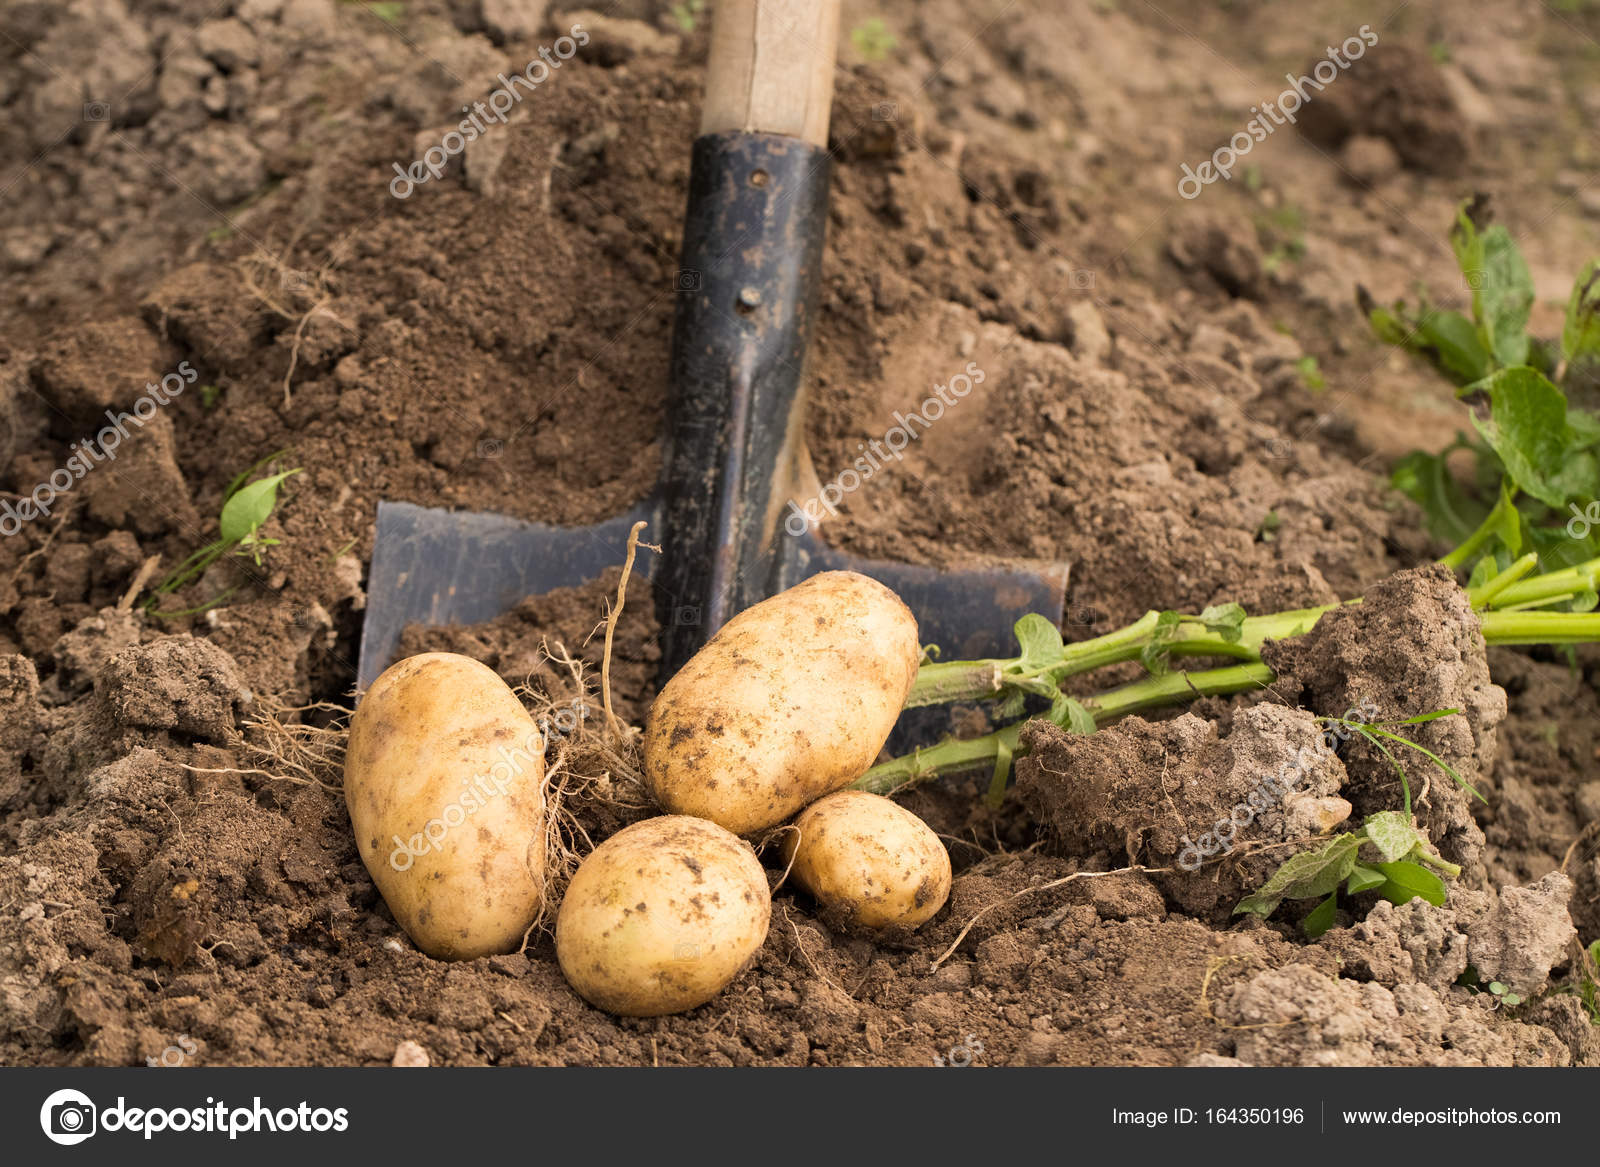 Garden Shovel In Ground With Ripe Potatoes. — Stock Photo © Elena ...